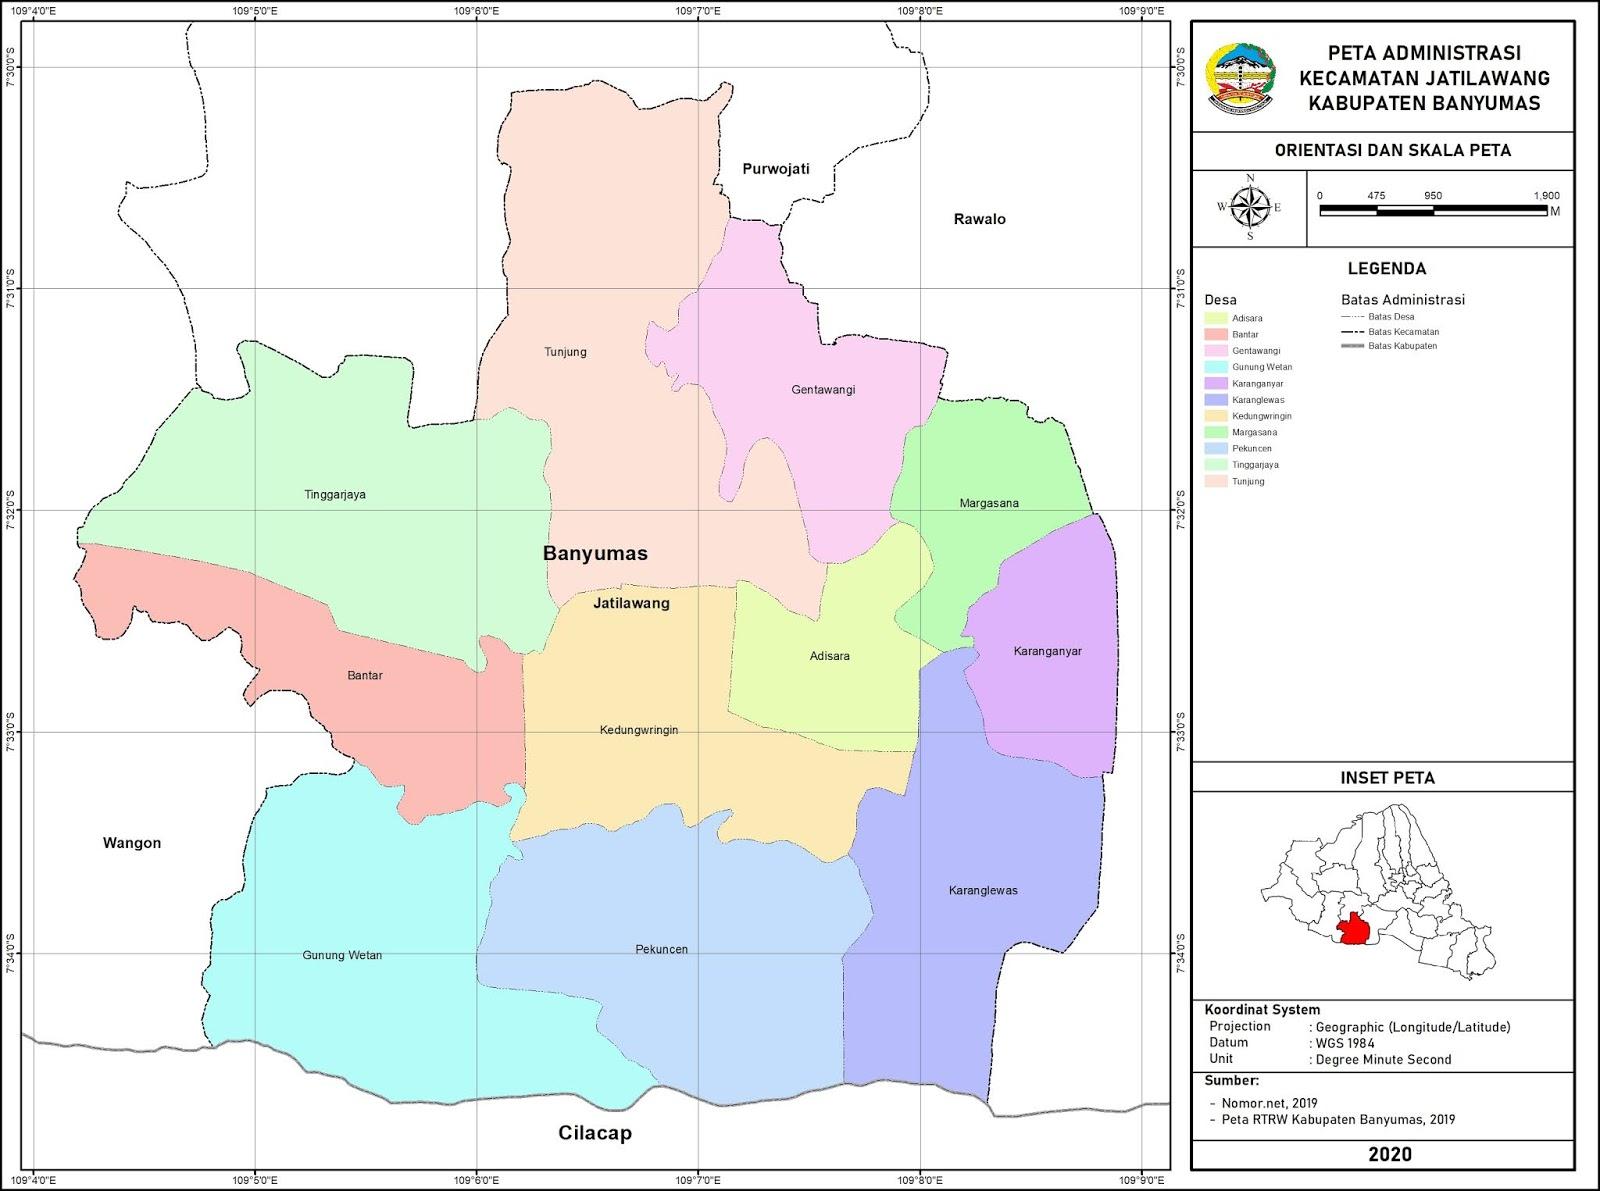 Peta Administrasi Kecamatan Jatilawang, Kabupaten Banyumas ...